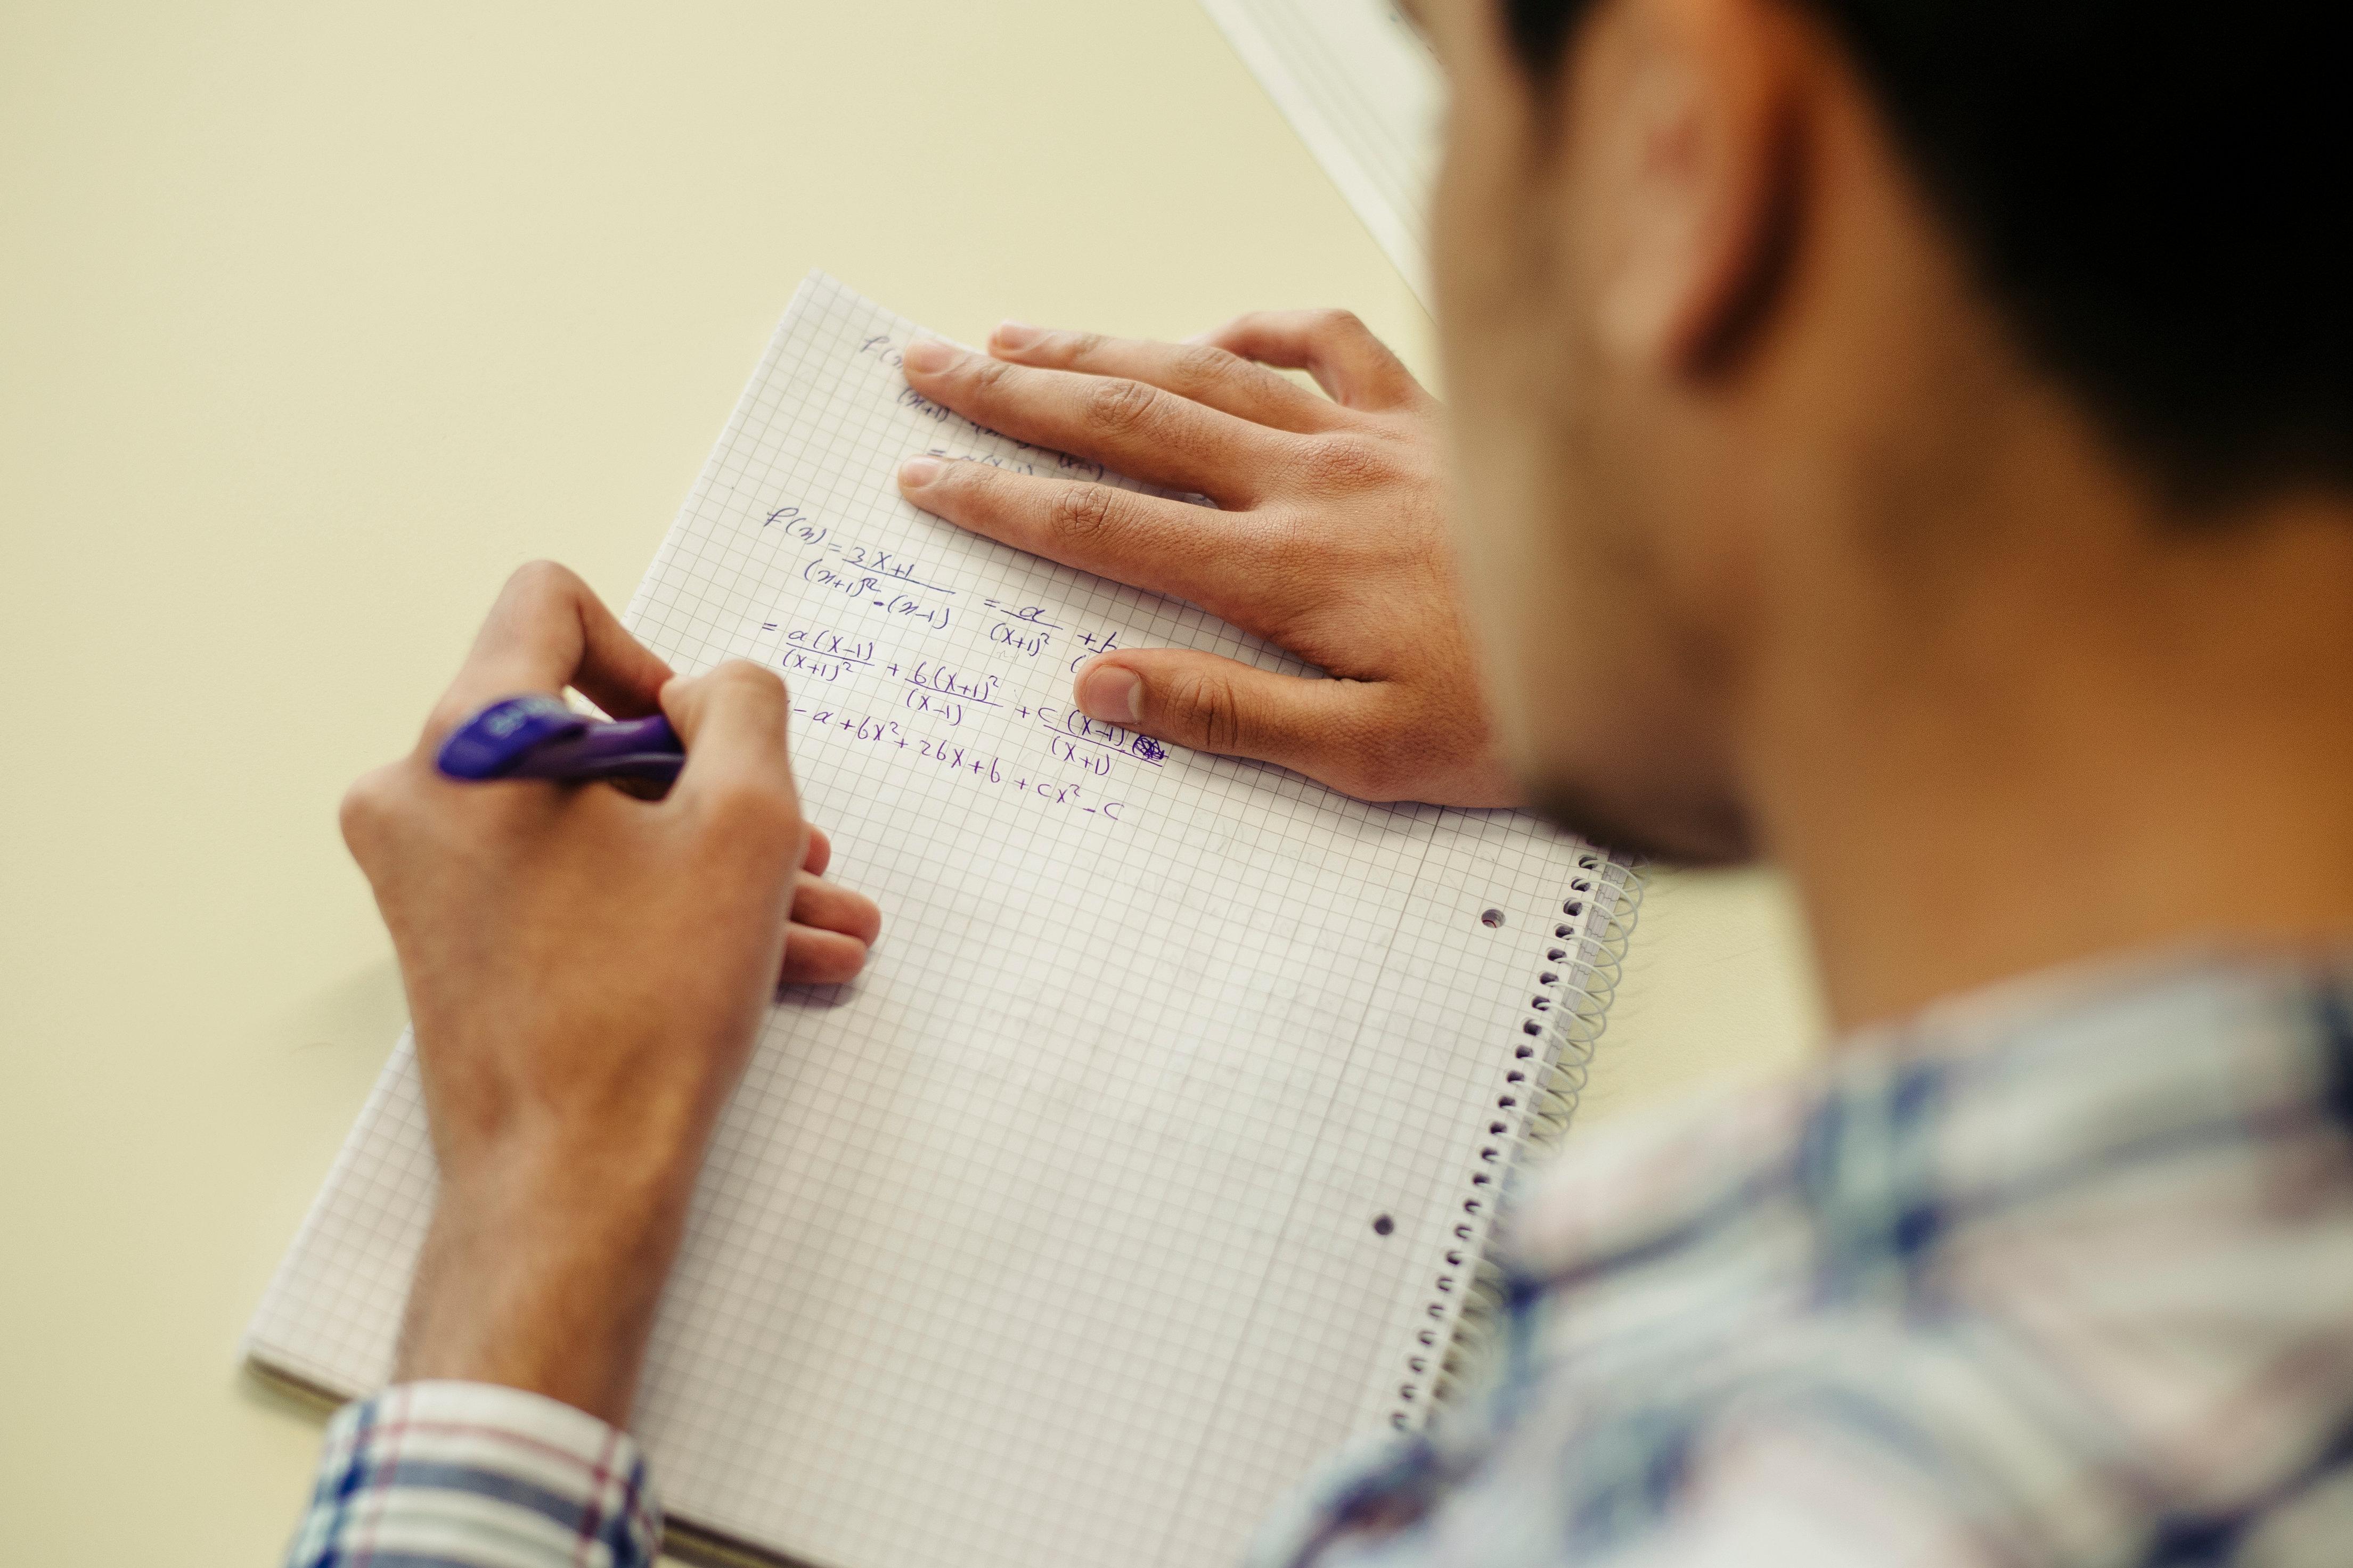 Universities prepare refugees for studies